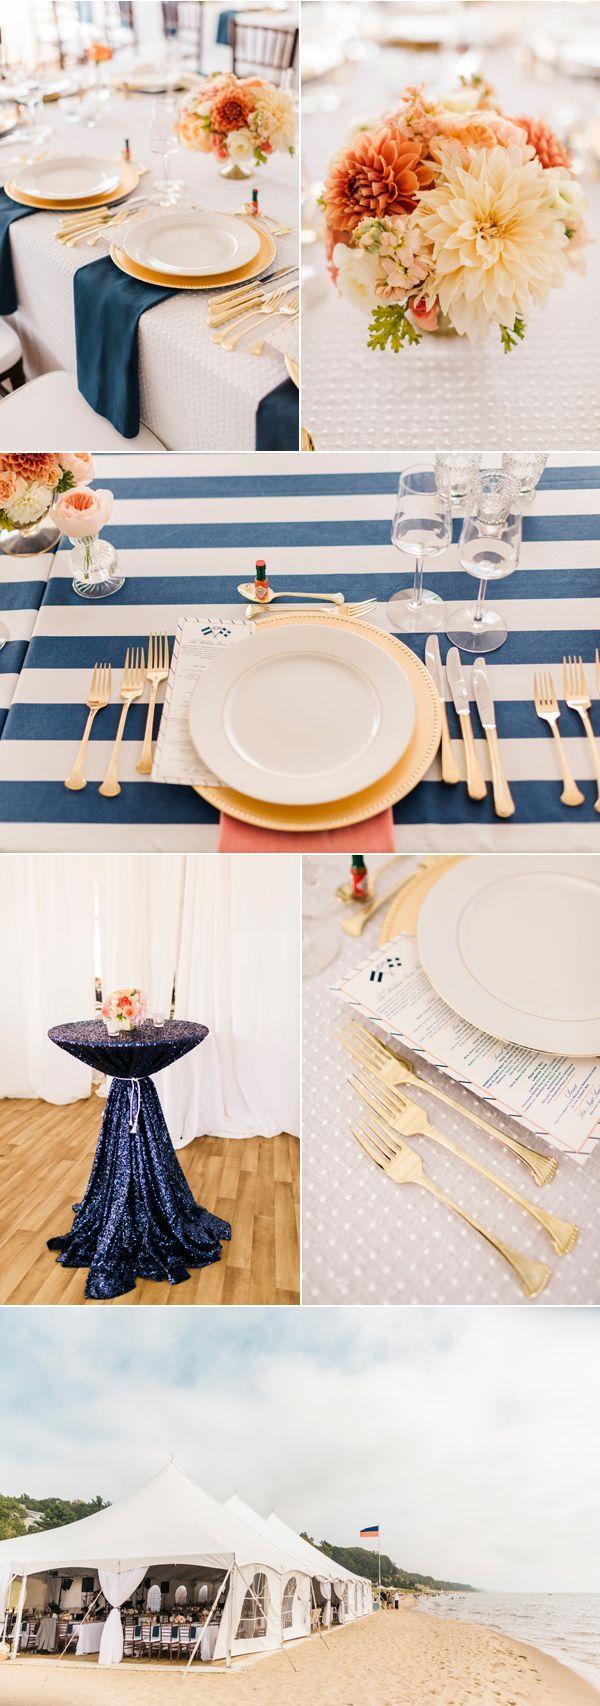 Peach Blush And Blue Wedding Color Theme Reception Decor Tablescape Fls